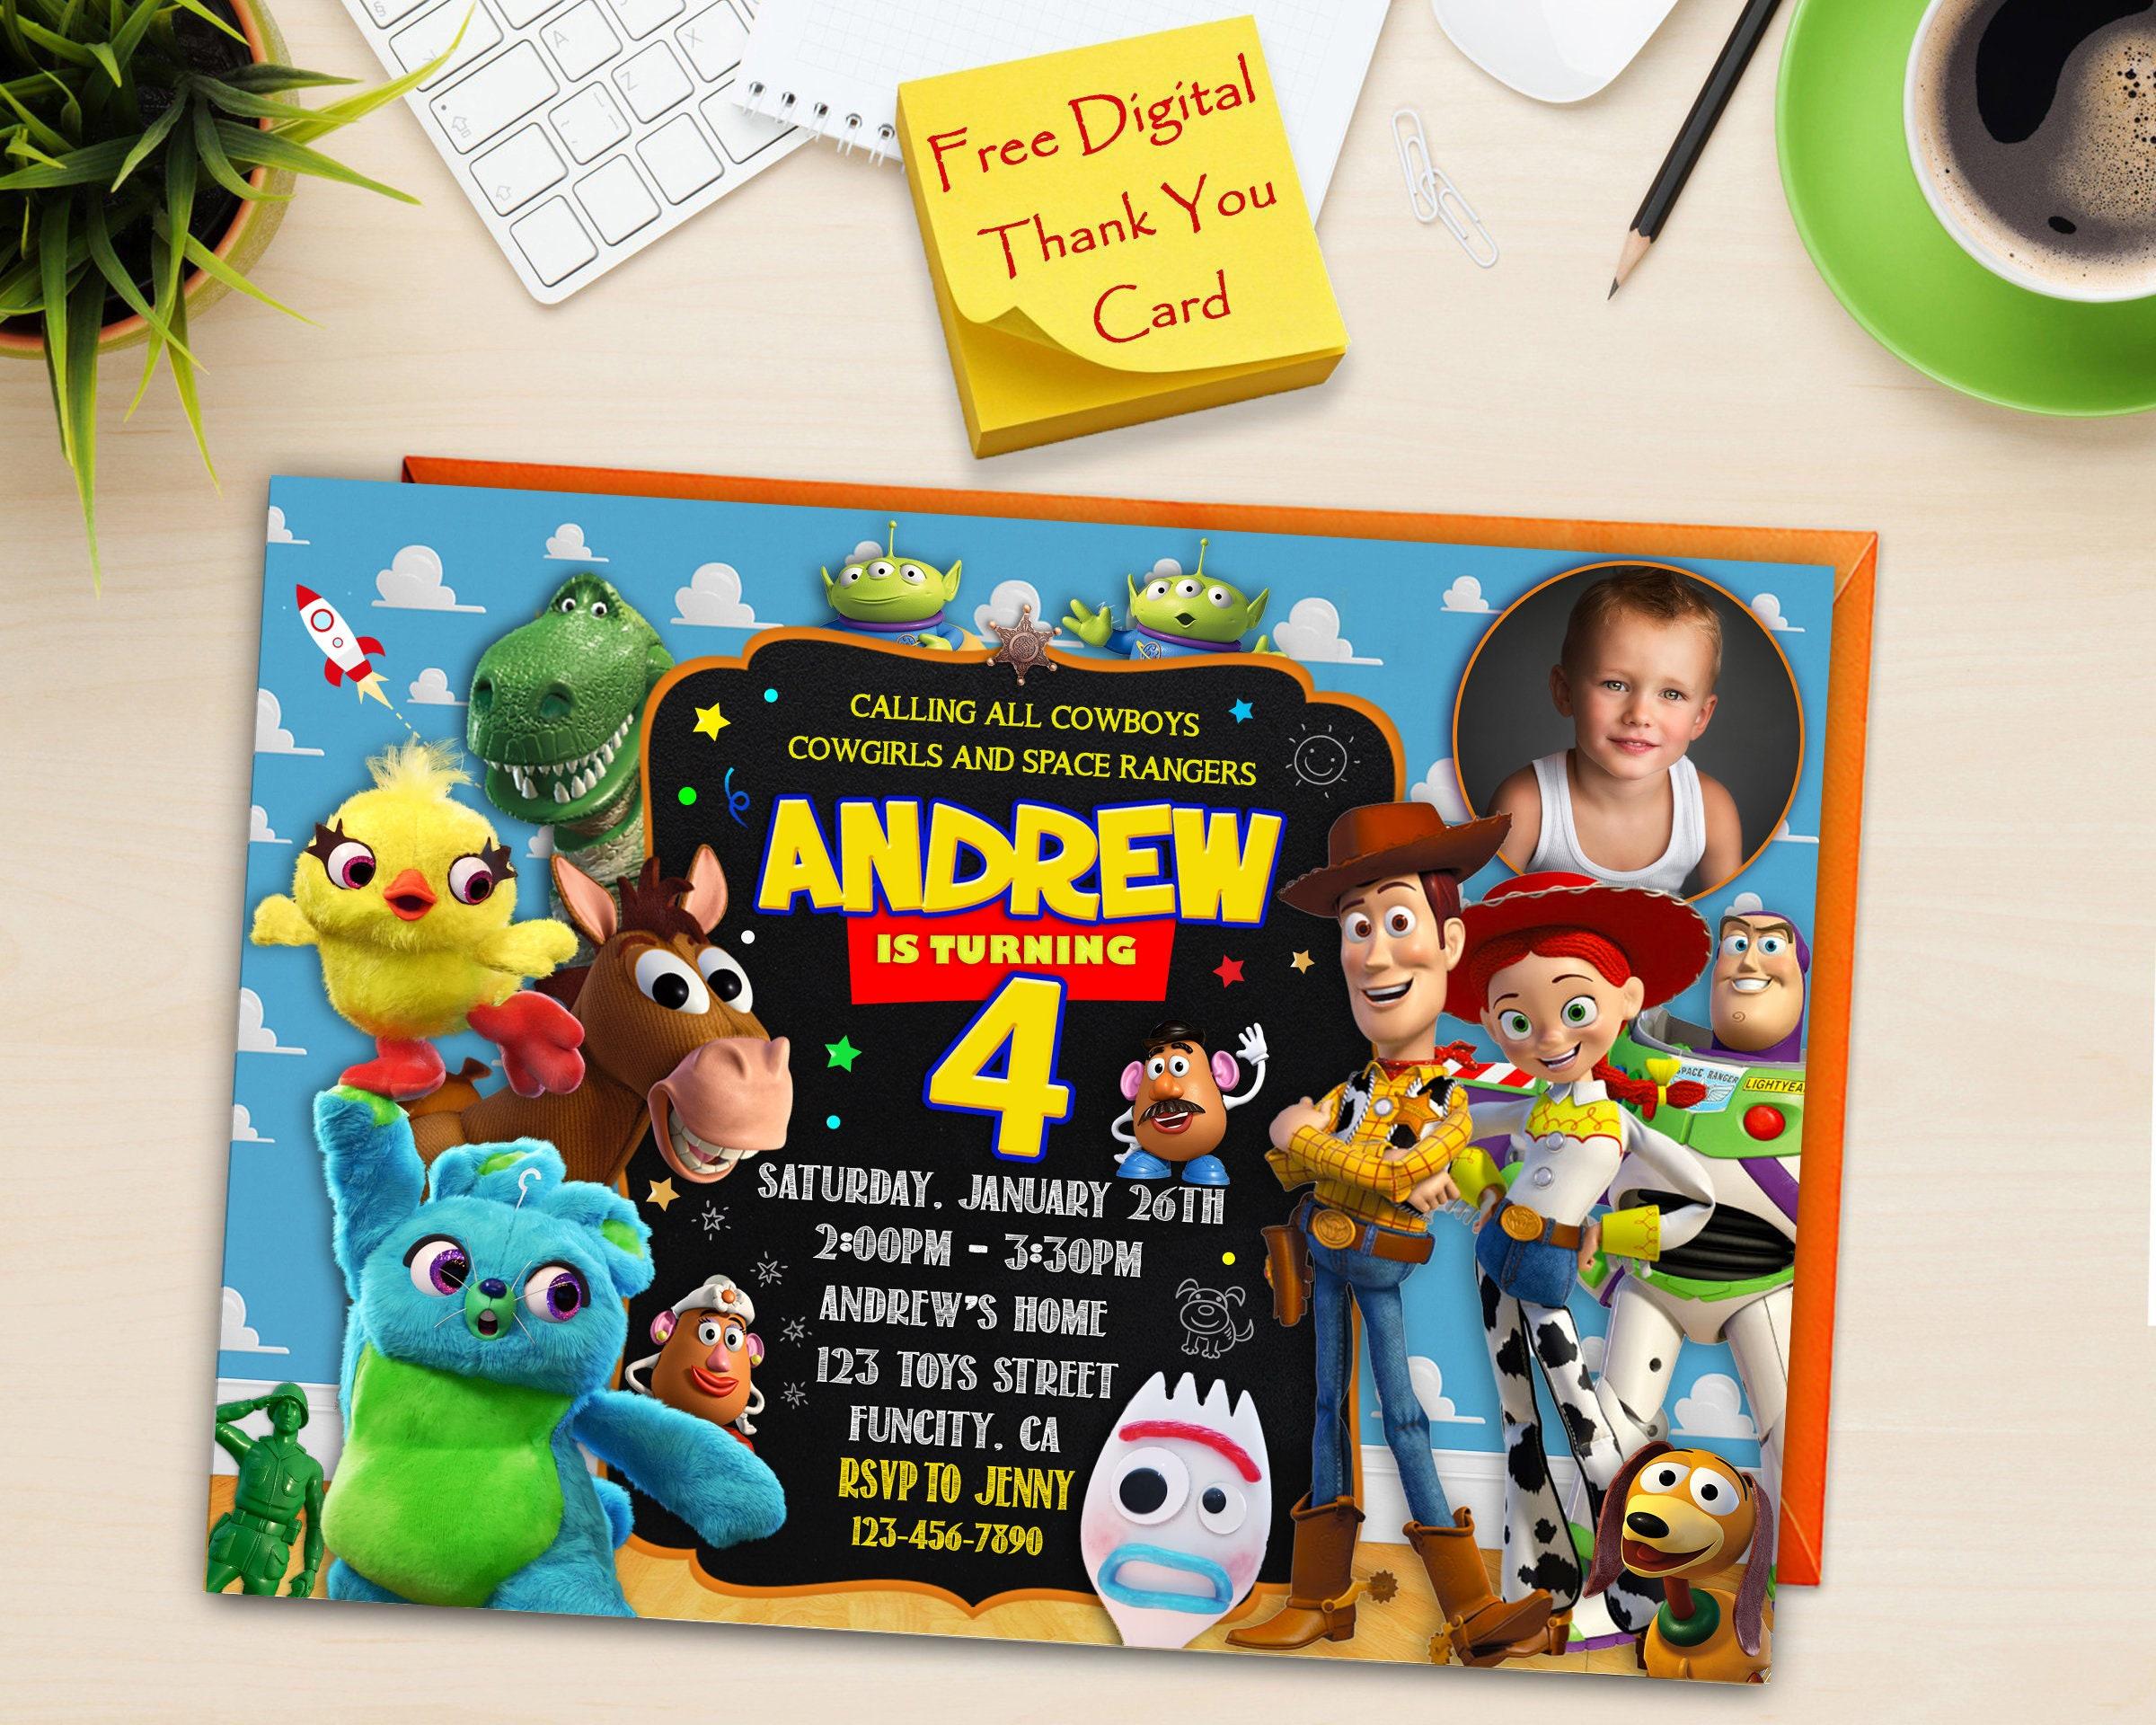 Toy Story 3 Inviteinstant Downloadprintable Disney Toy Etsy